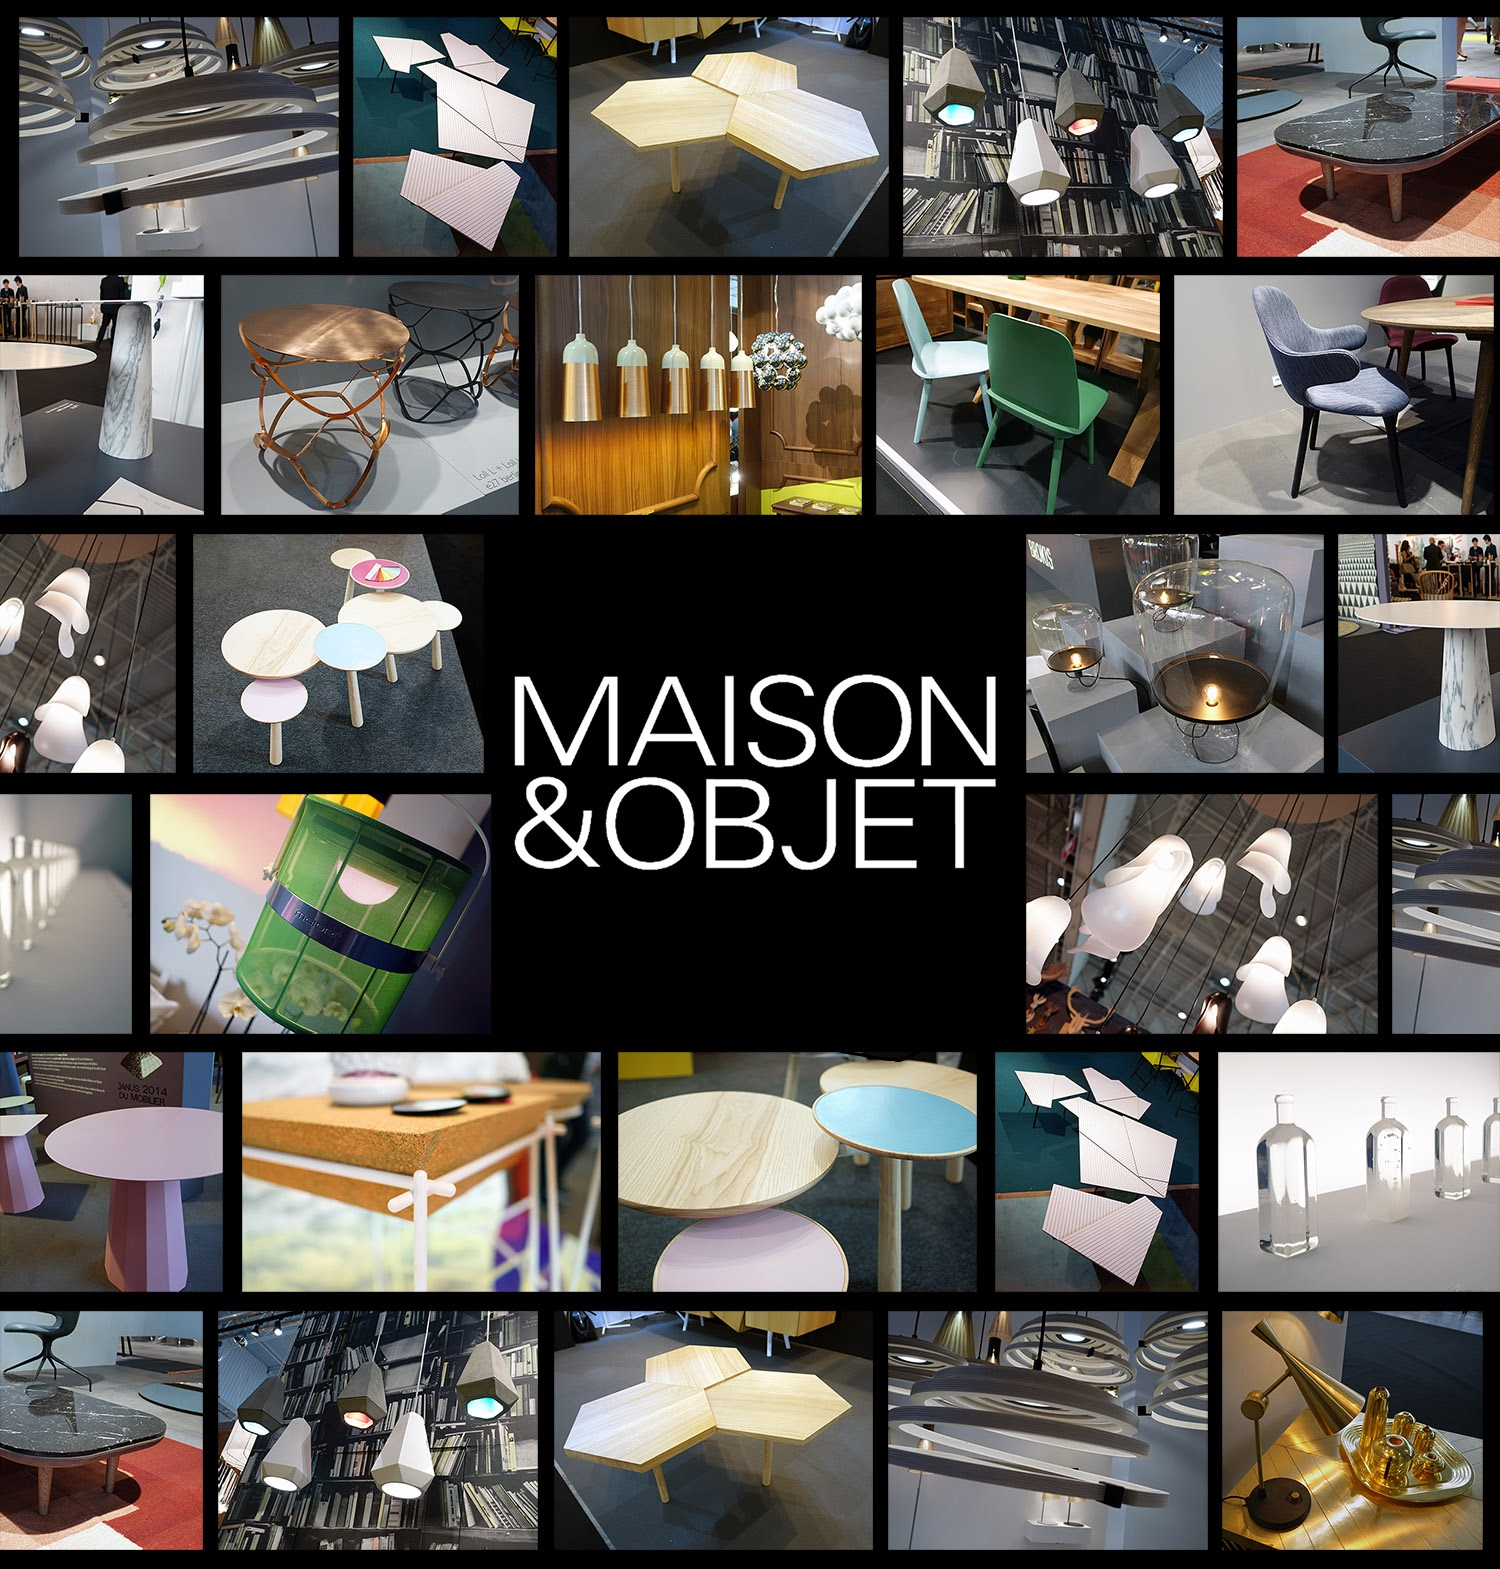 What is Maison & Objet 2015 What is Maison & Objet 2015 Maison et Objet 2015